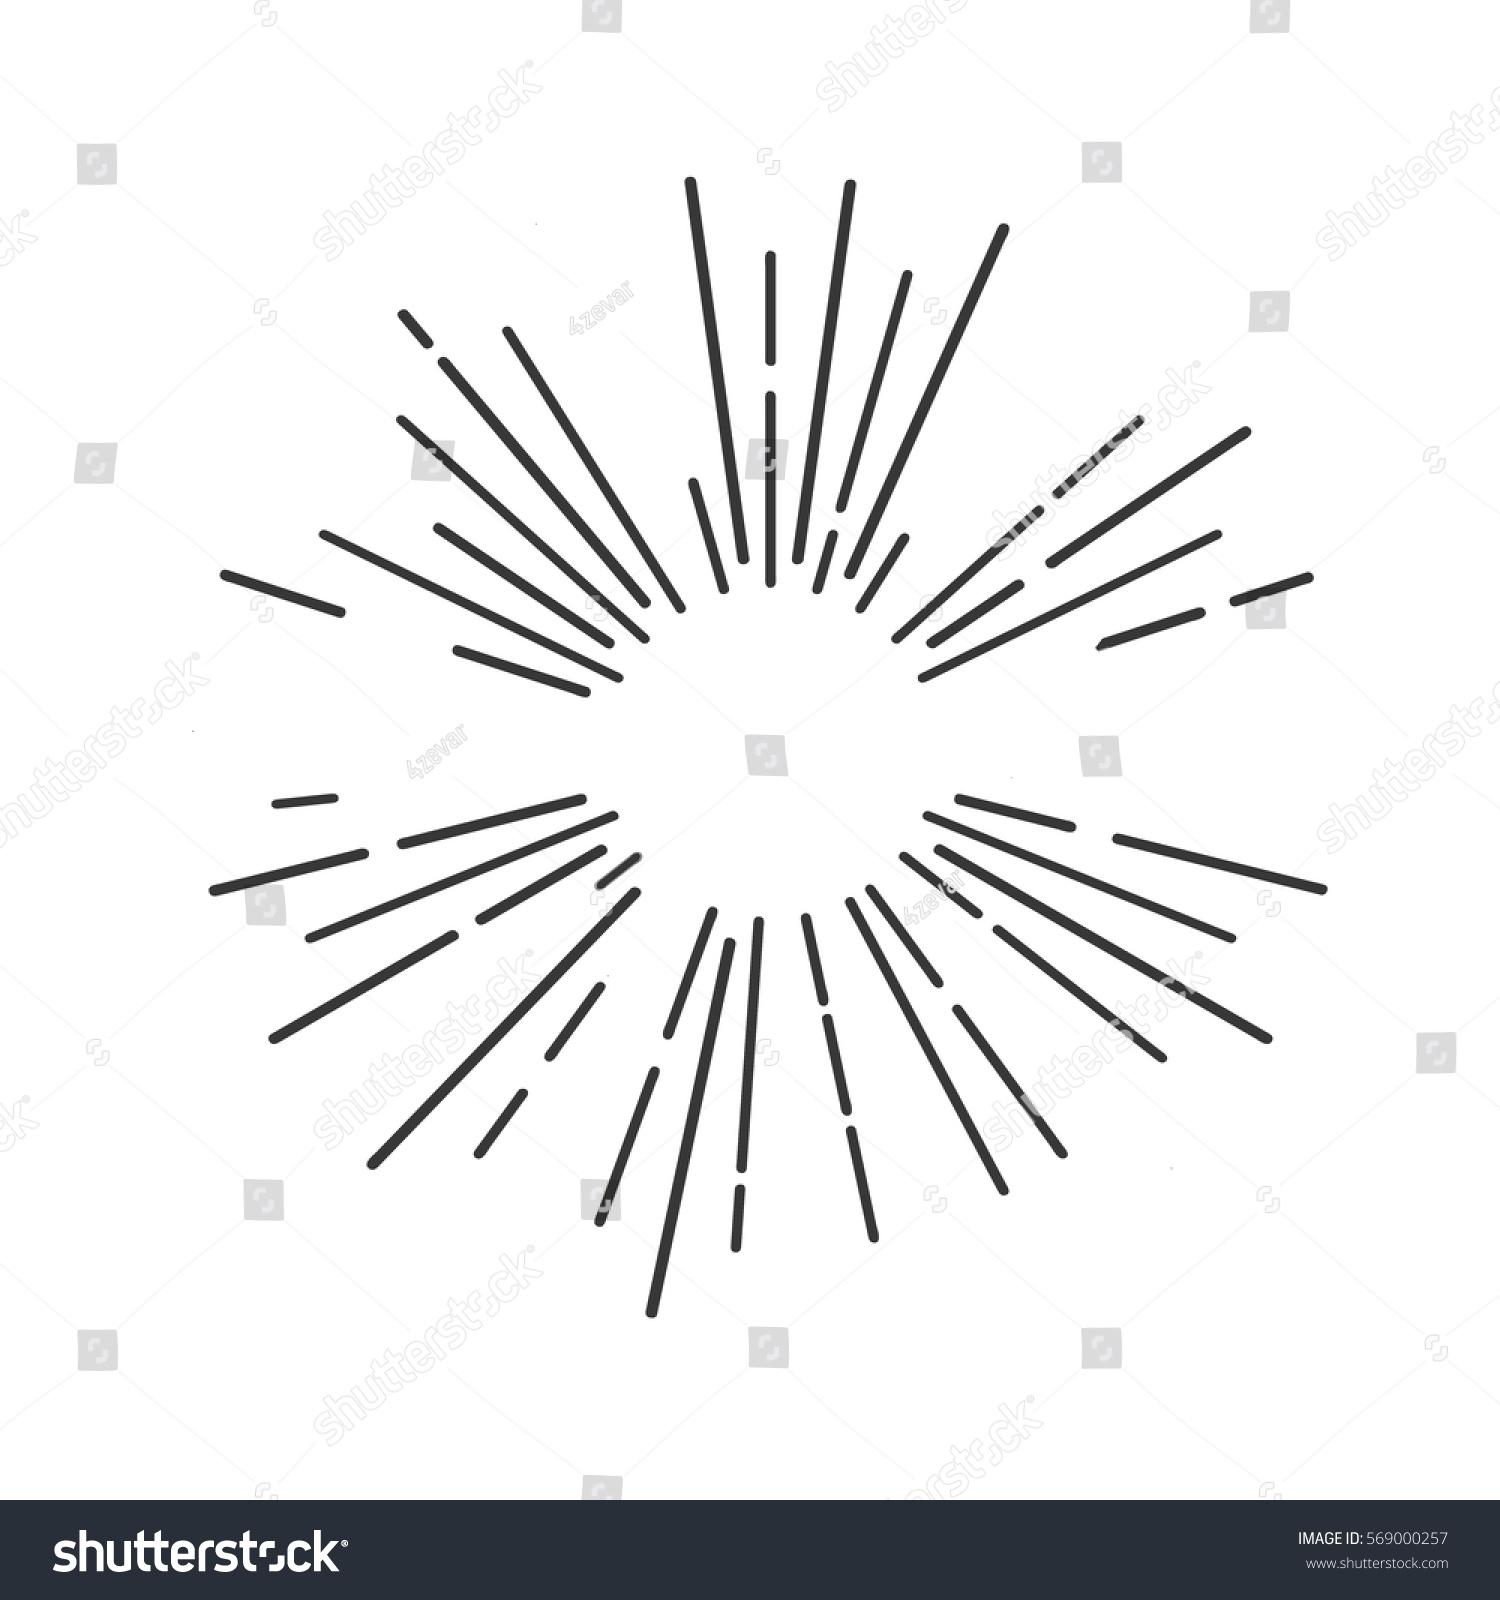 Line Drawing Sun Vector : Sun rays hand drawn linear drawing stock vector